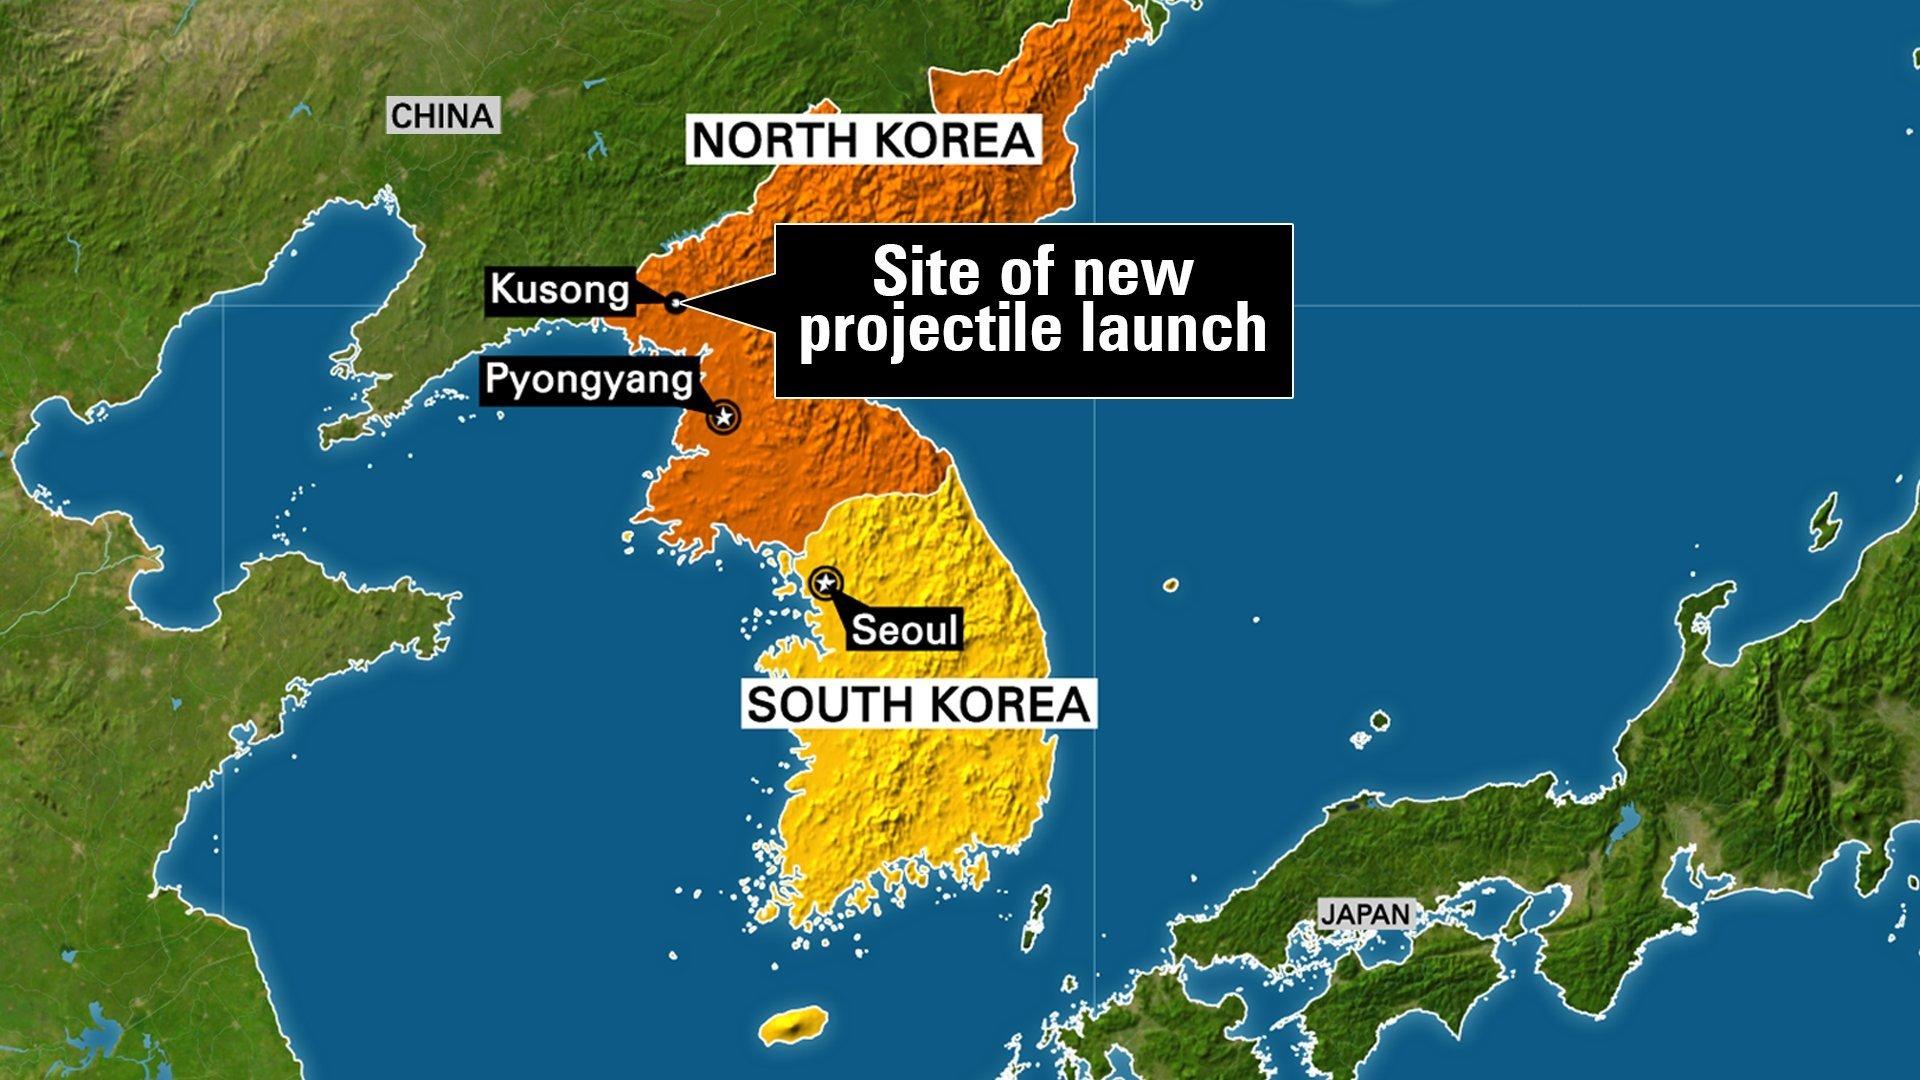 THAAD radar detected N. Korea's missile launch: defense chief